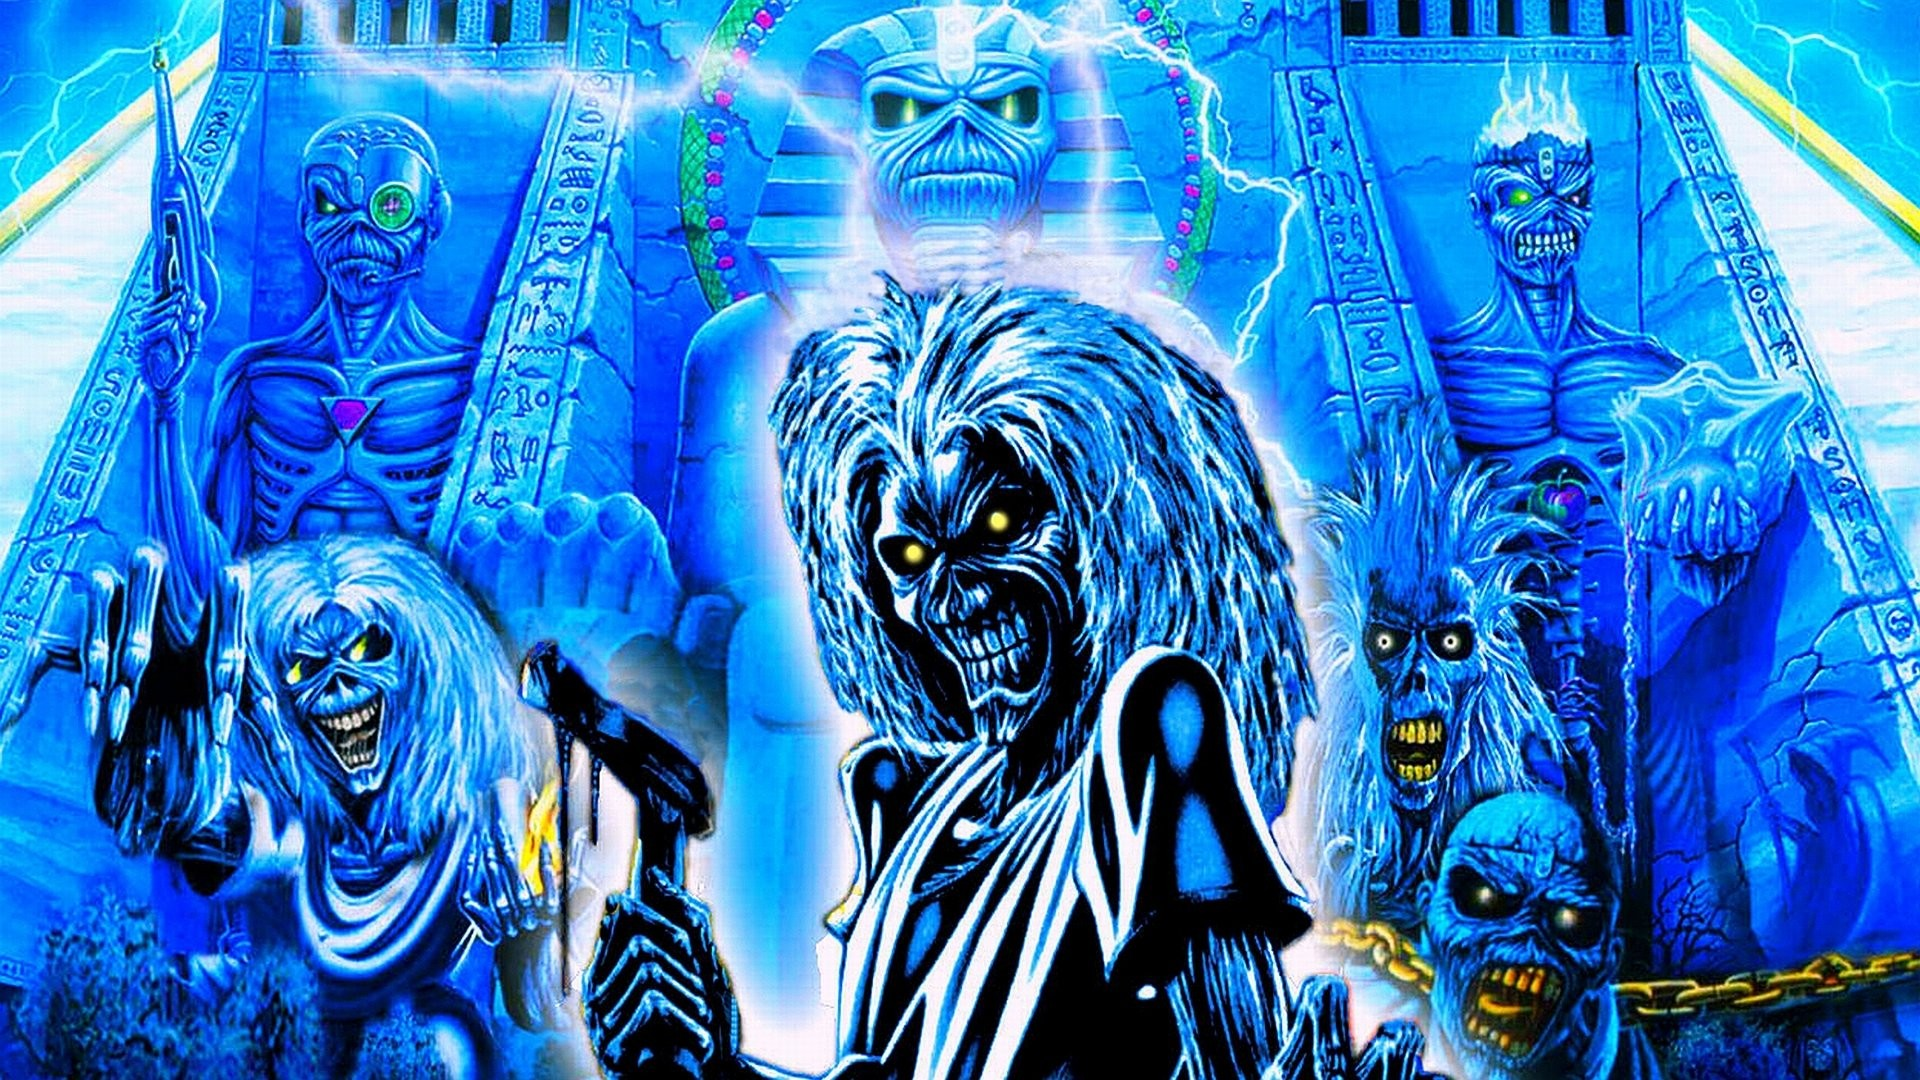 Iron Maiden Wallpaper 2149x1080 Tablet